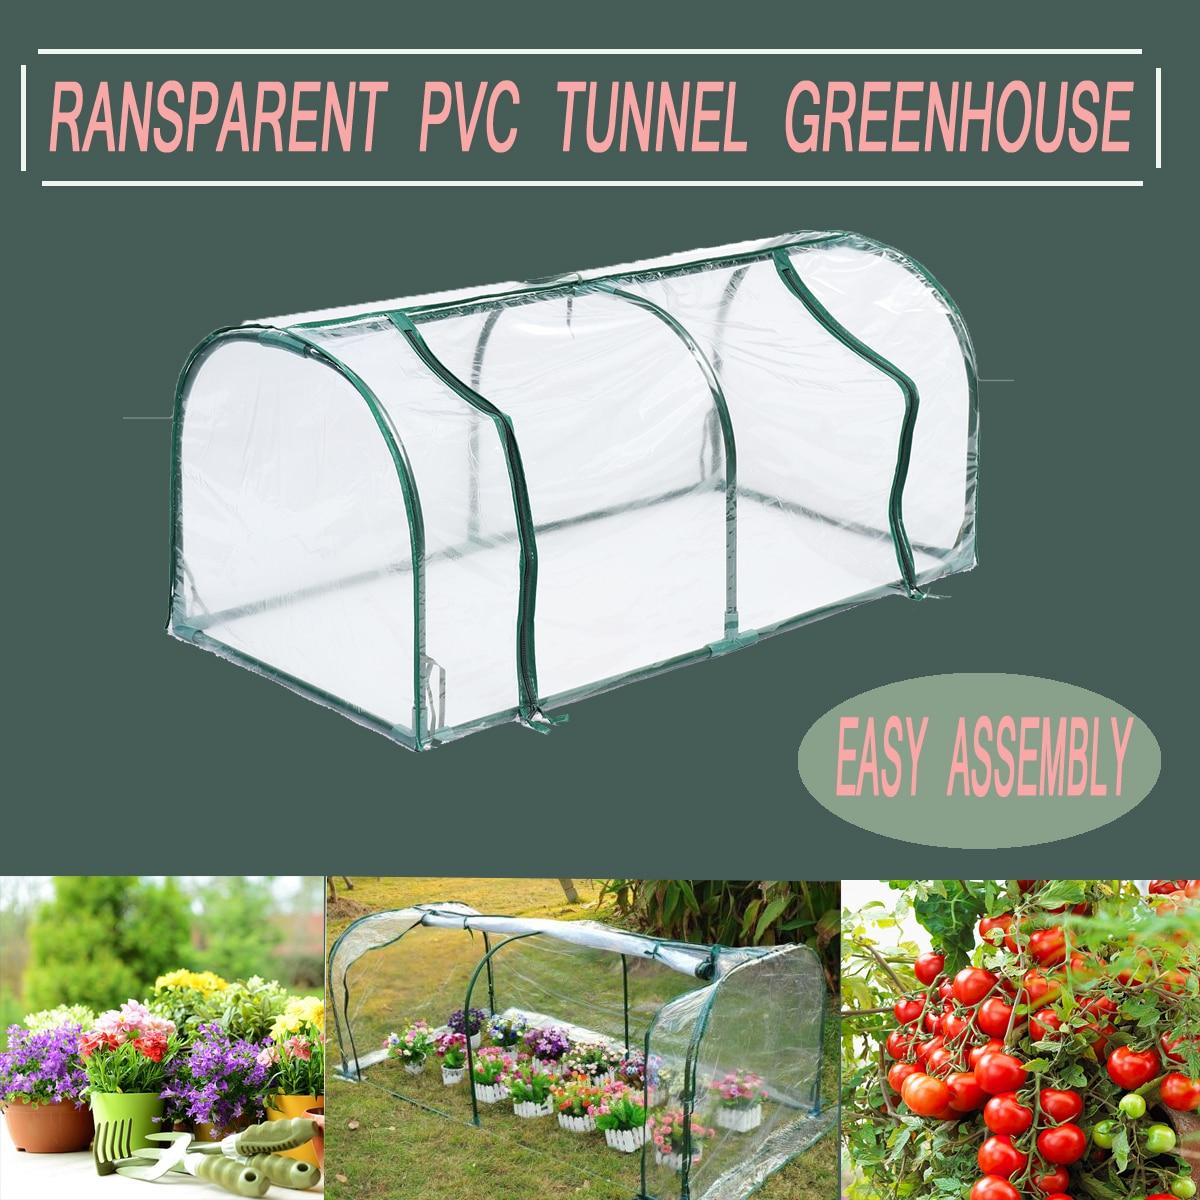 Съемная стальная рама наружная растительная крышка на молнии садовая теплица ПВХ теплая садовая Бытовая растительная крышка 128X60X58 см